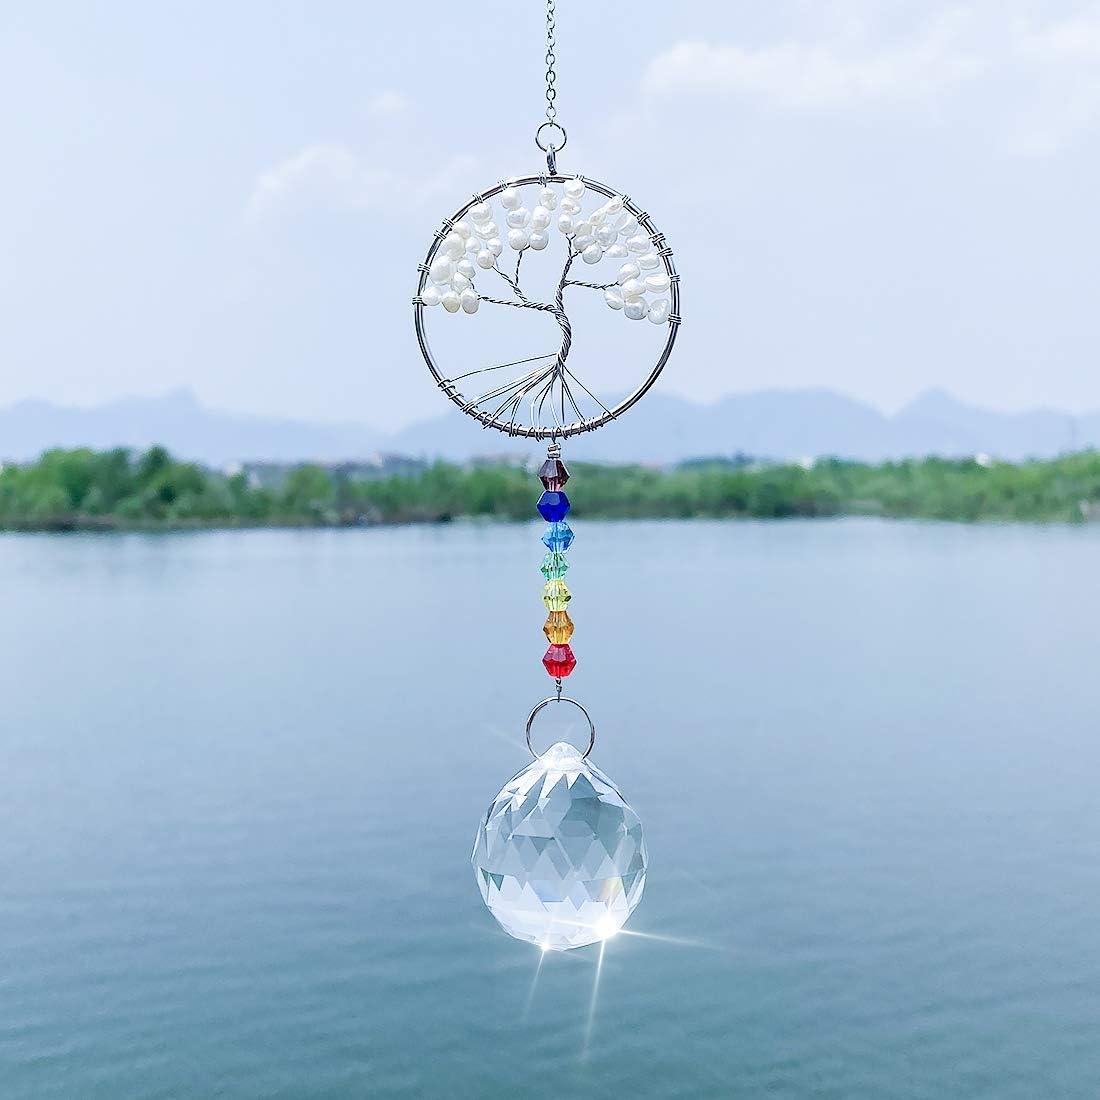 LONGSHENG Since 2001 Chakra Imitation Pearls Tree Of Life Chandelier Suncatcher For Windows Hanging Fengshui Crystal Rainbow Ornaments Mix 2 Style 2pcs